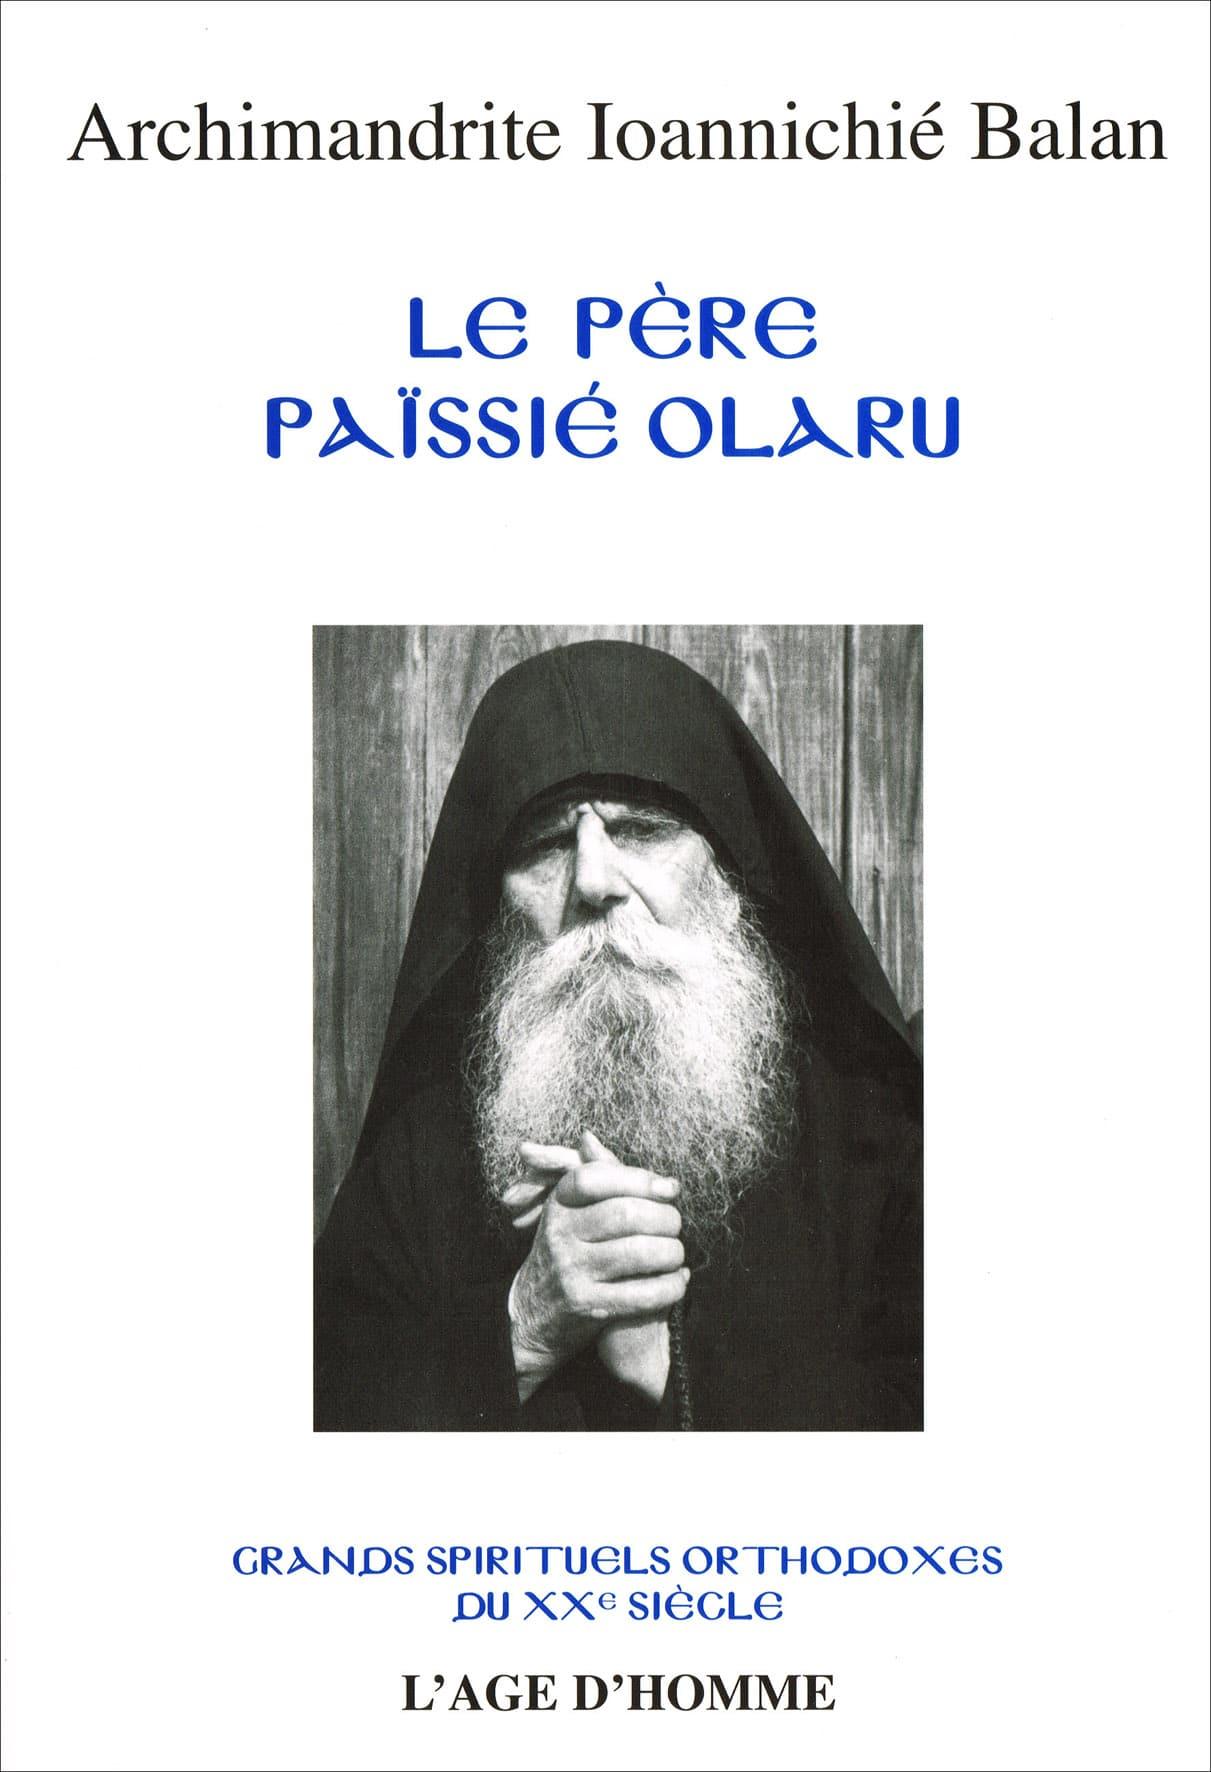 http://www.orthodoxie.com/wp-content/uploads/2012/05/Pai%CC%88ssie%CC%81_Olaru.jpg?75c1d8